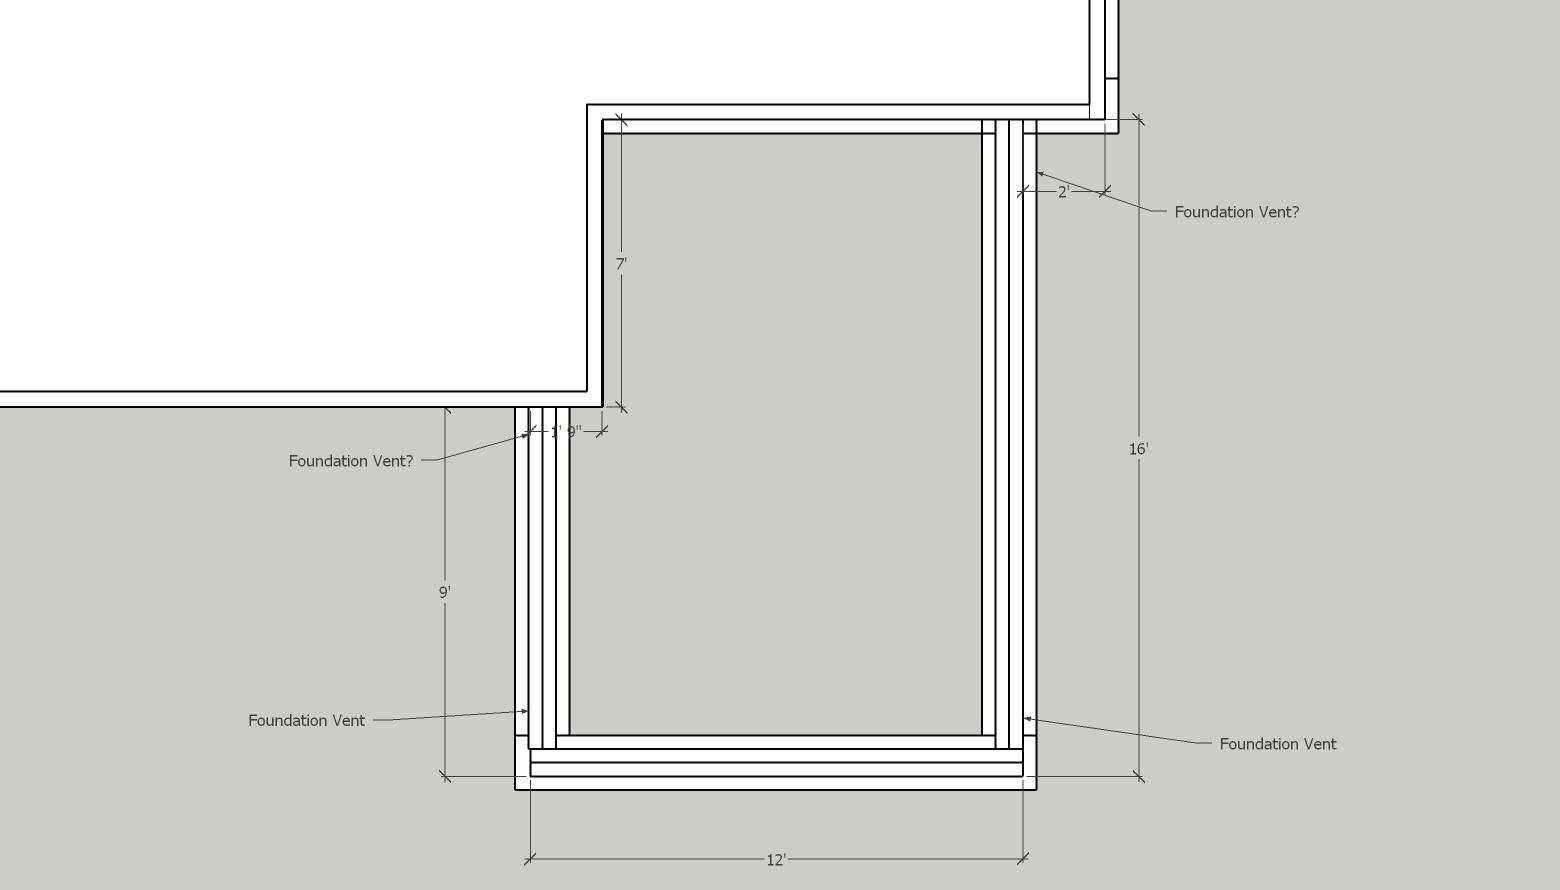 Foundation Vents In Addition-van-santvoord-addition.jpg